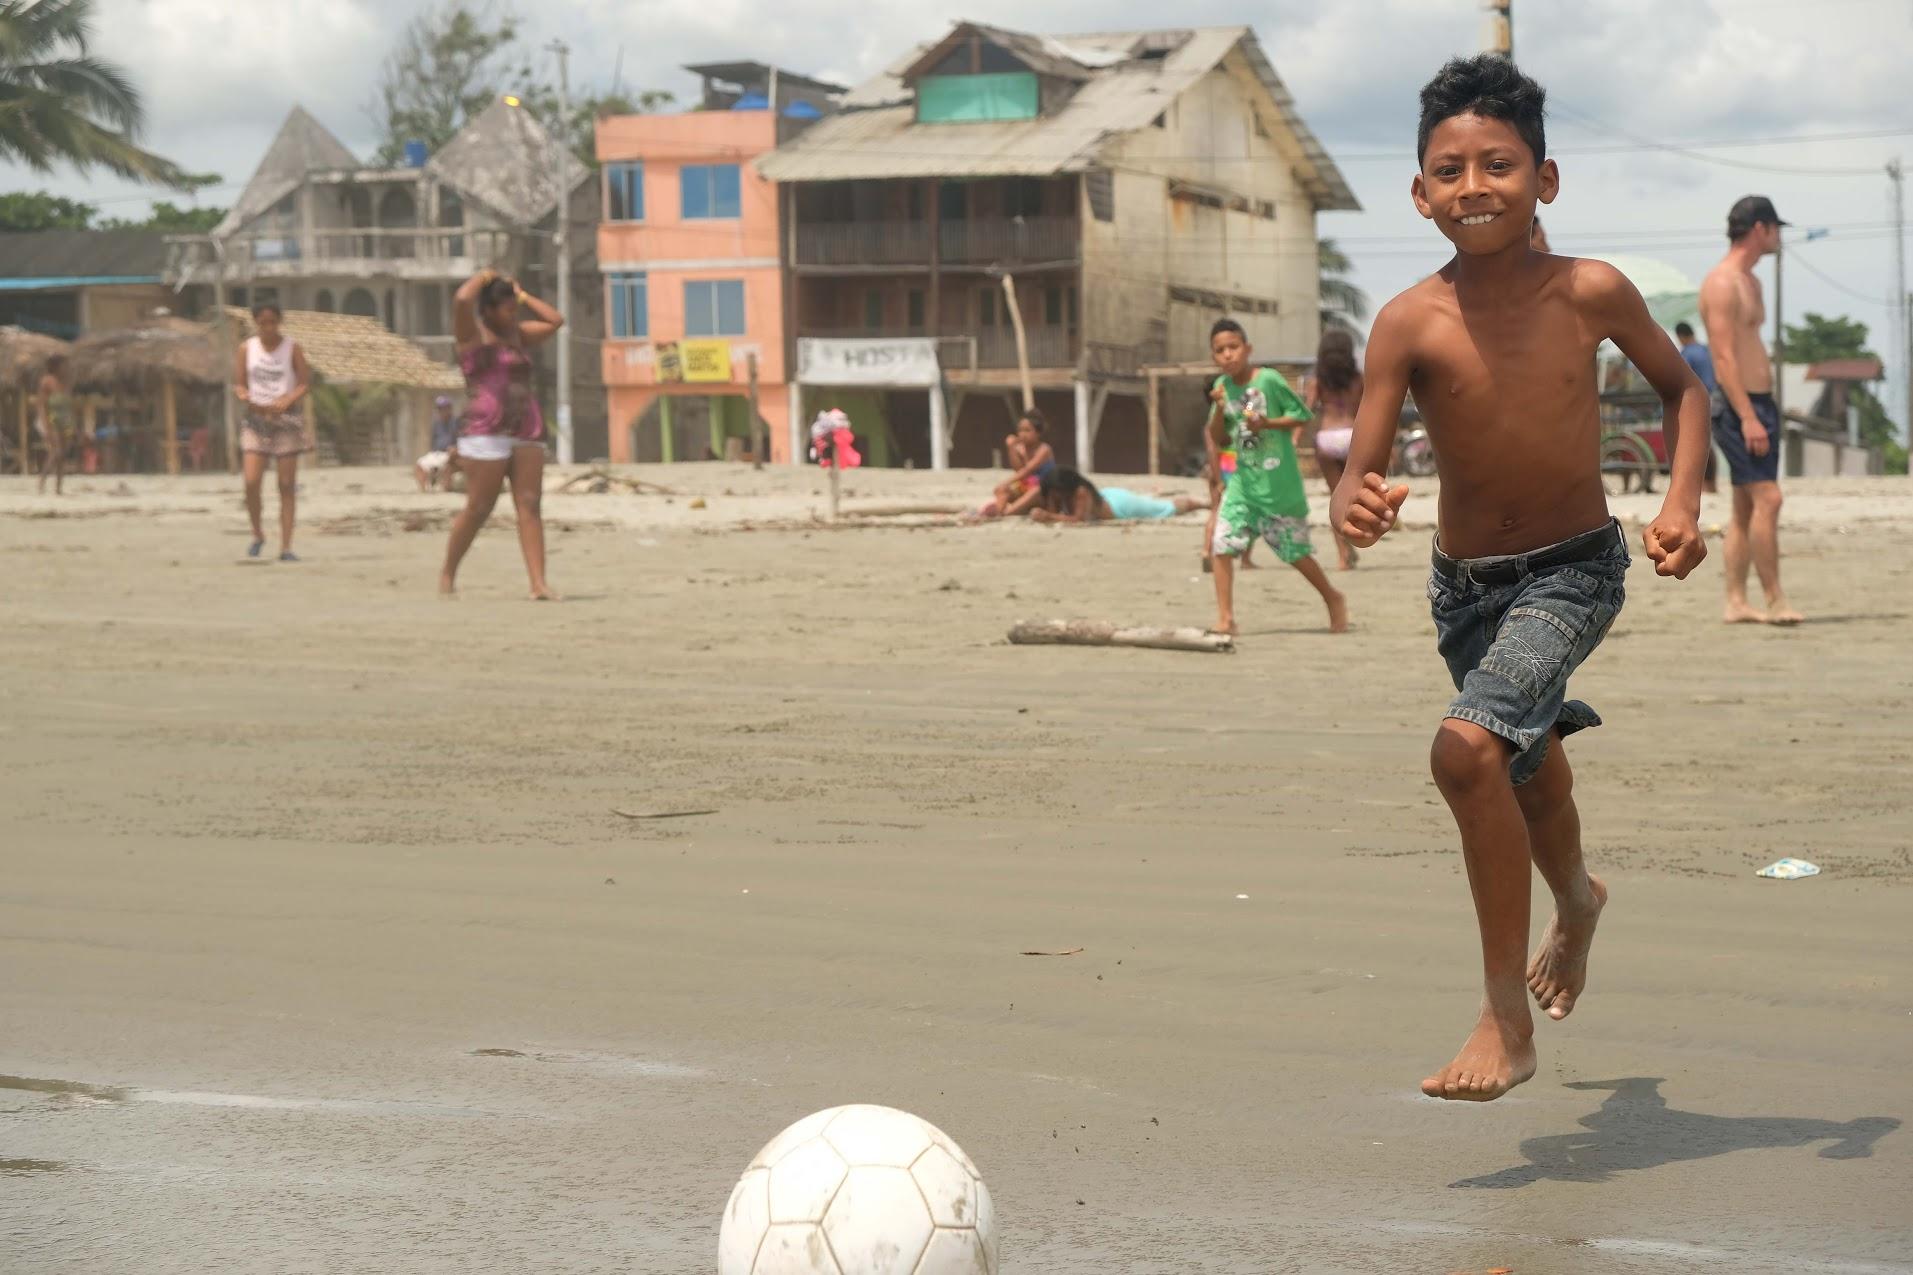 Levitating on the beach in Ecuador.